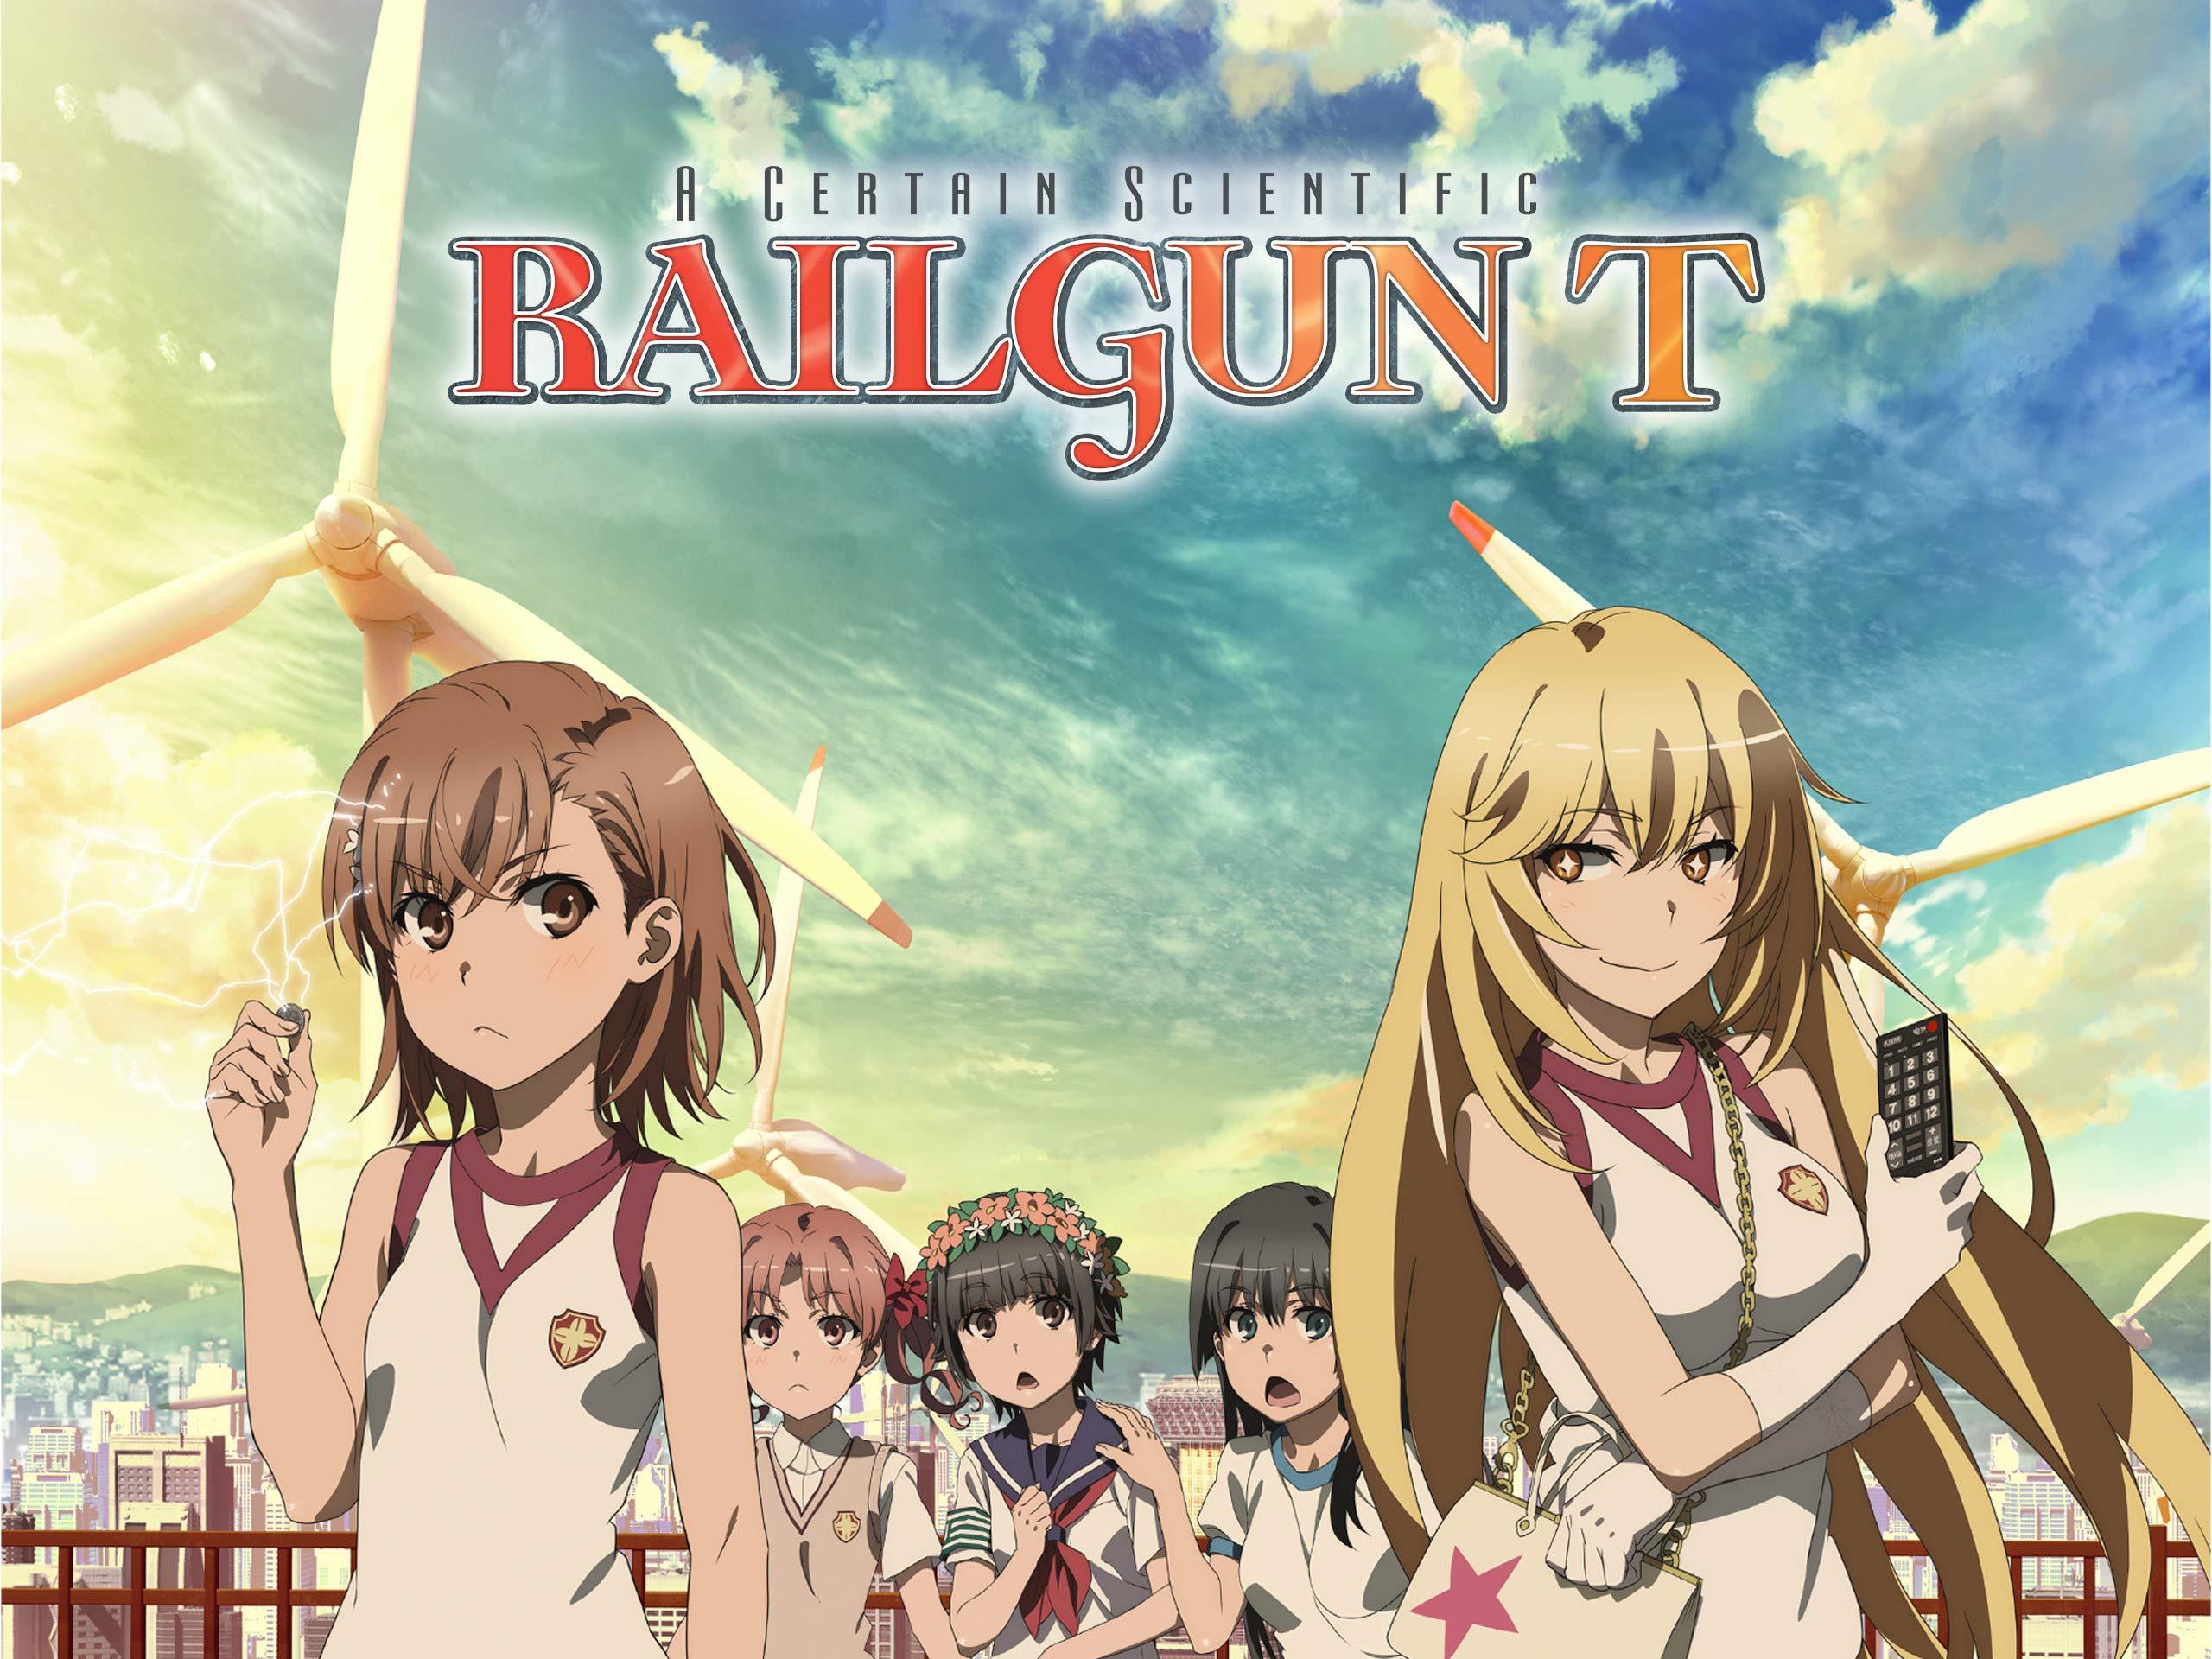 Watch A Certain Scientific Railgun T, Season 3, Pt. 1 (Original Japanese Version)   Prime Video